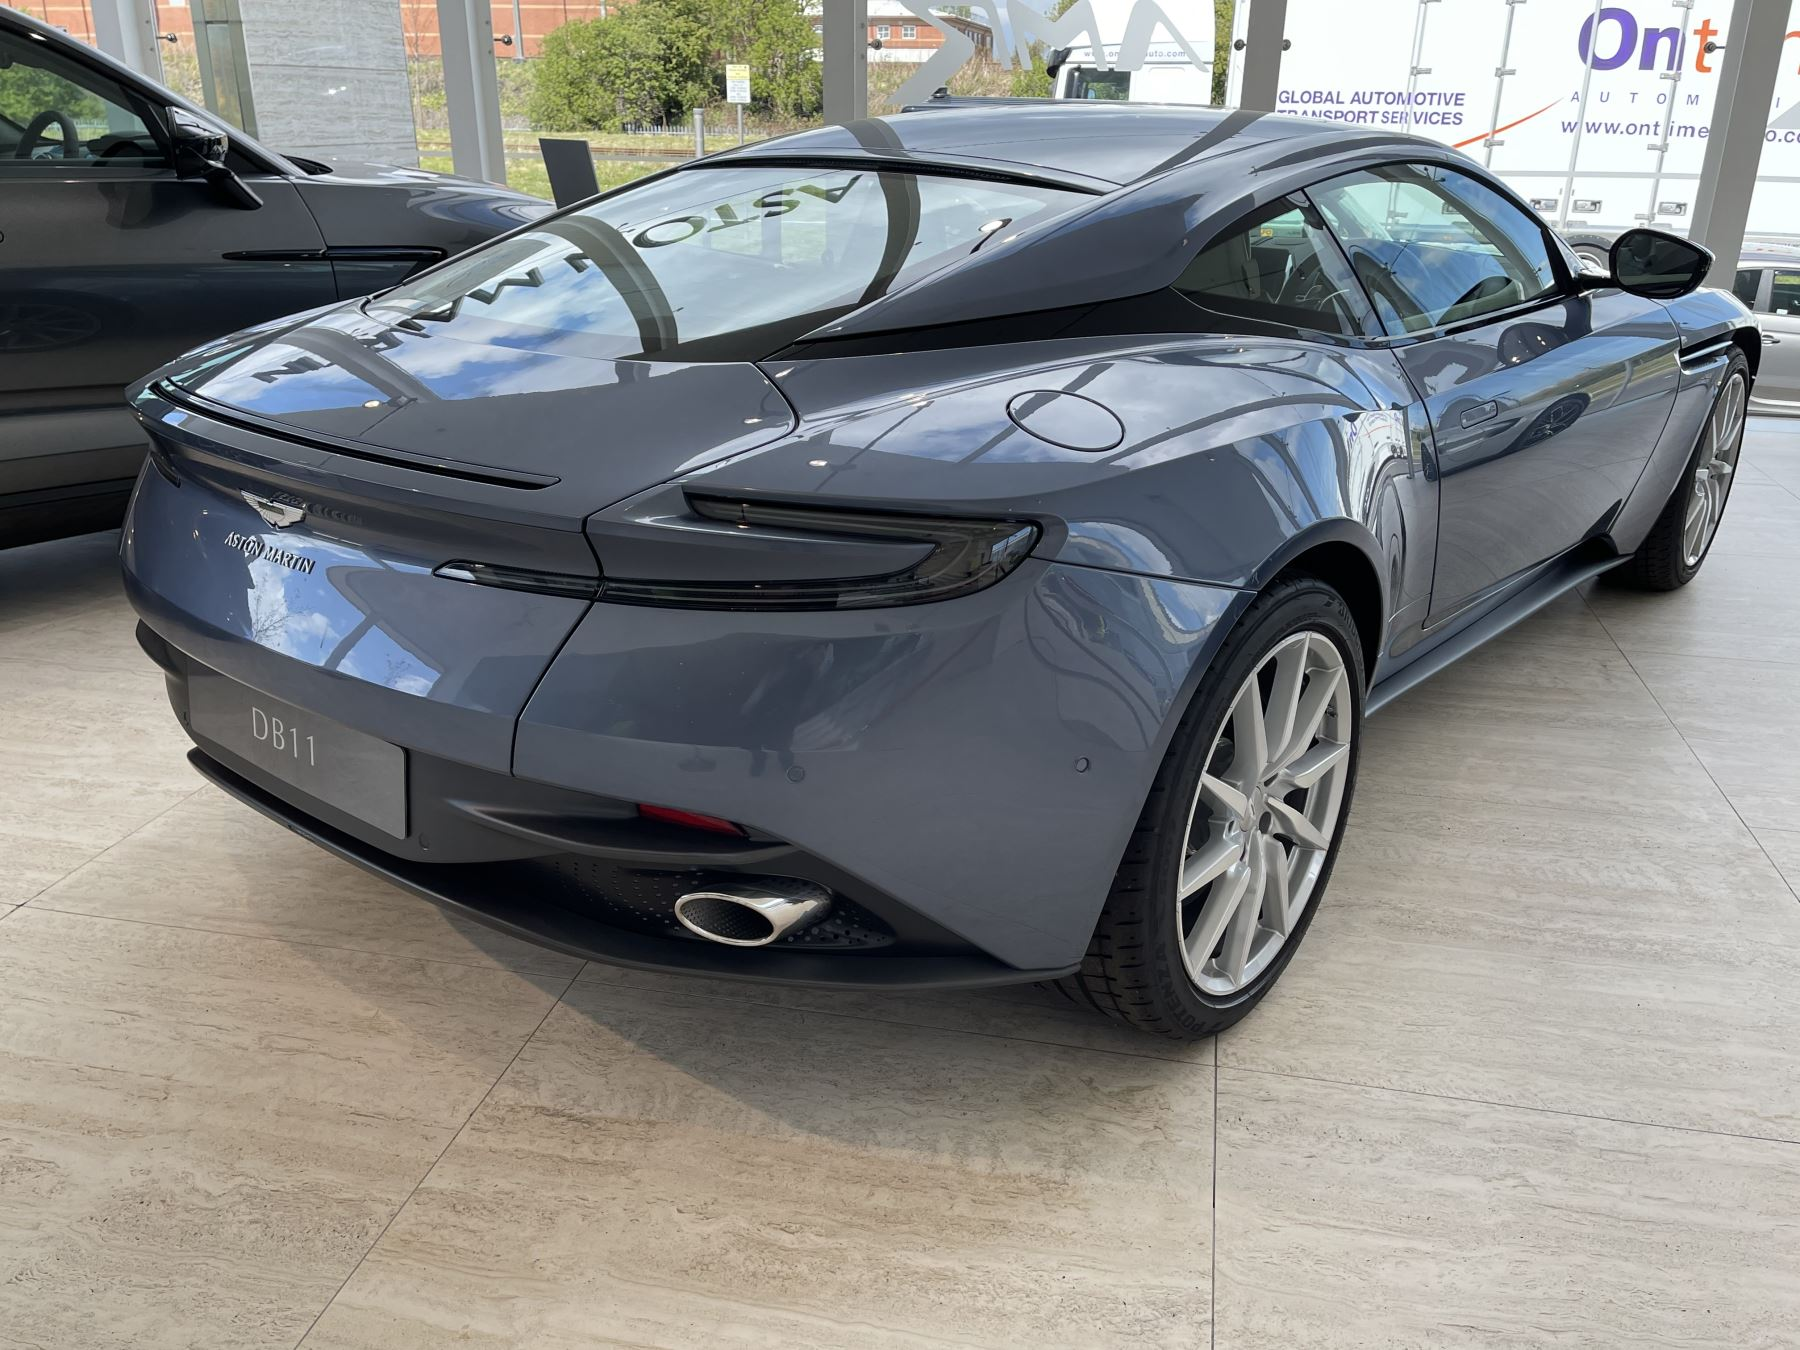 Aston Martin DB11 V8 Touchtronic image 13